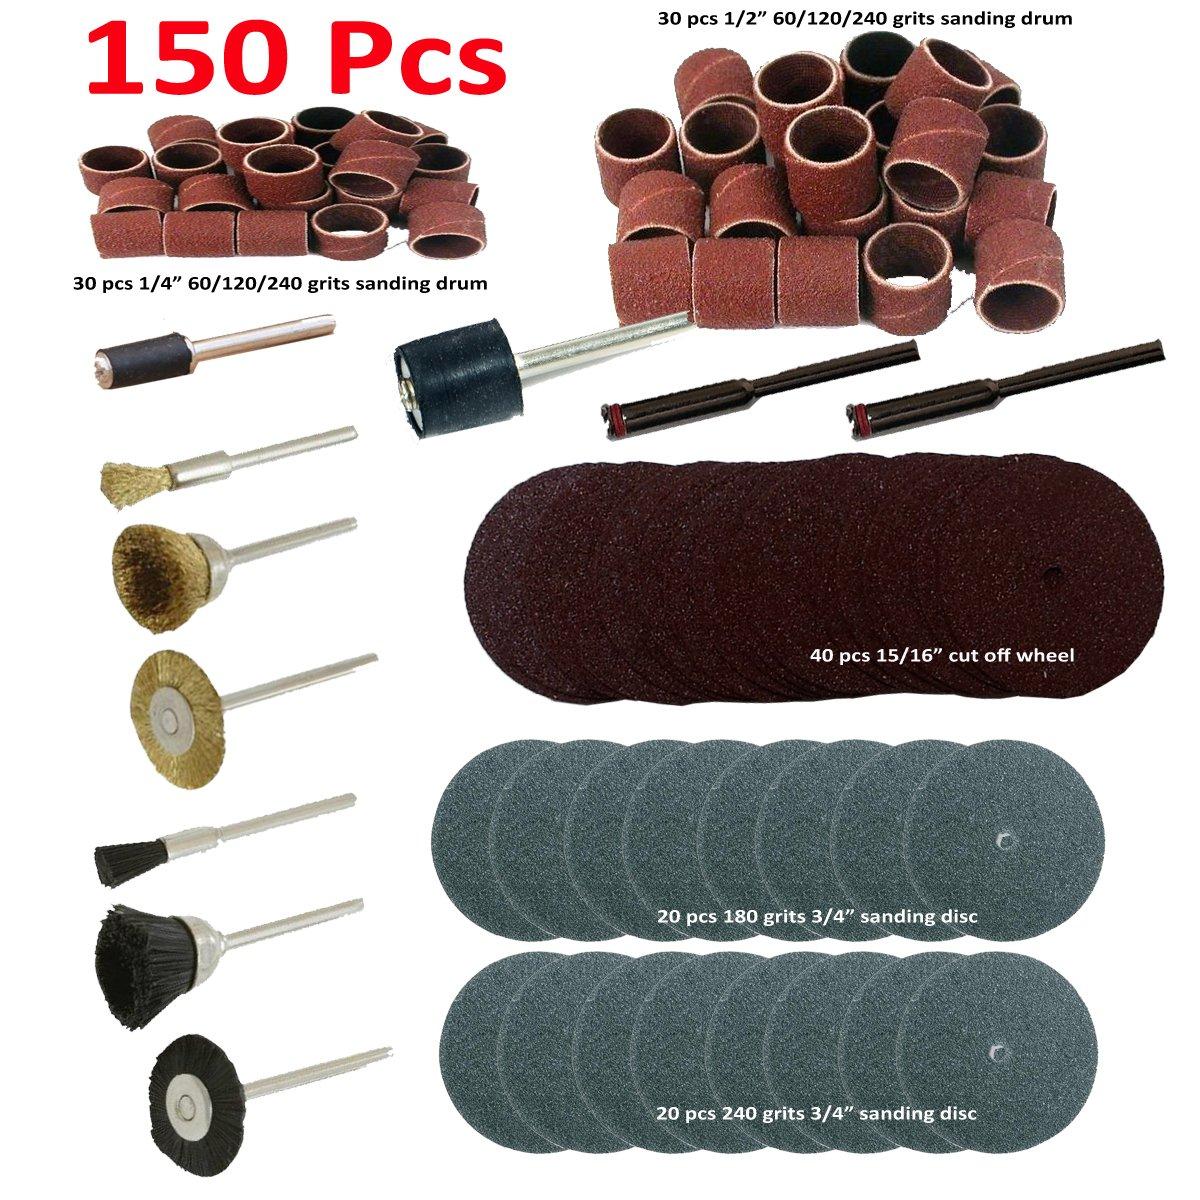 150X Fit Dremel Rotary Tool Accessories Kit Grinding Polishing Shank Craft Bits